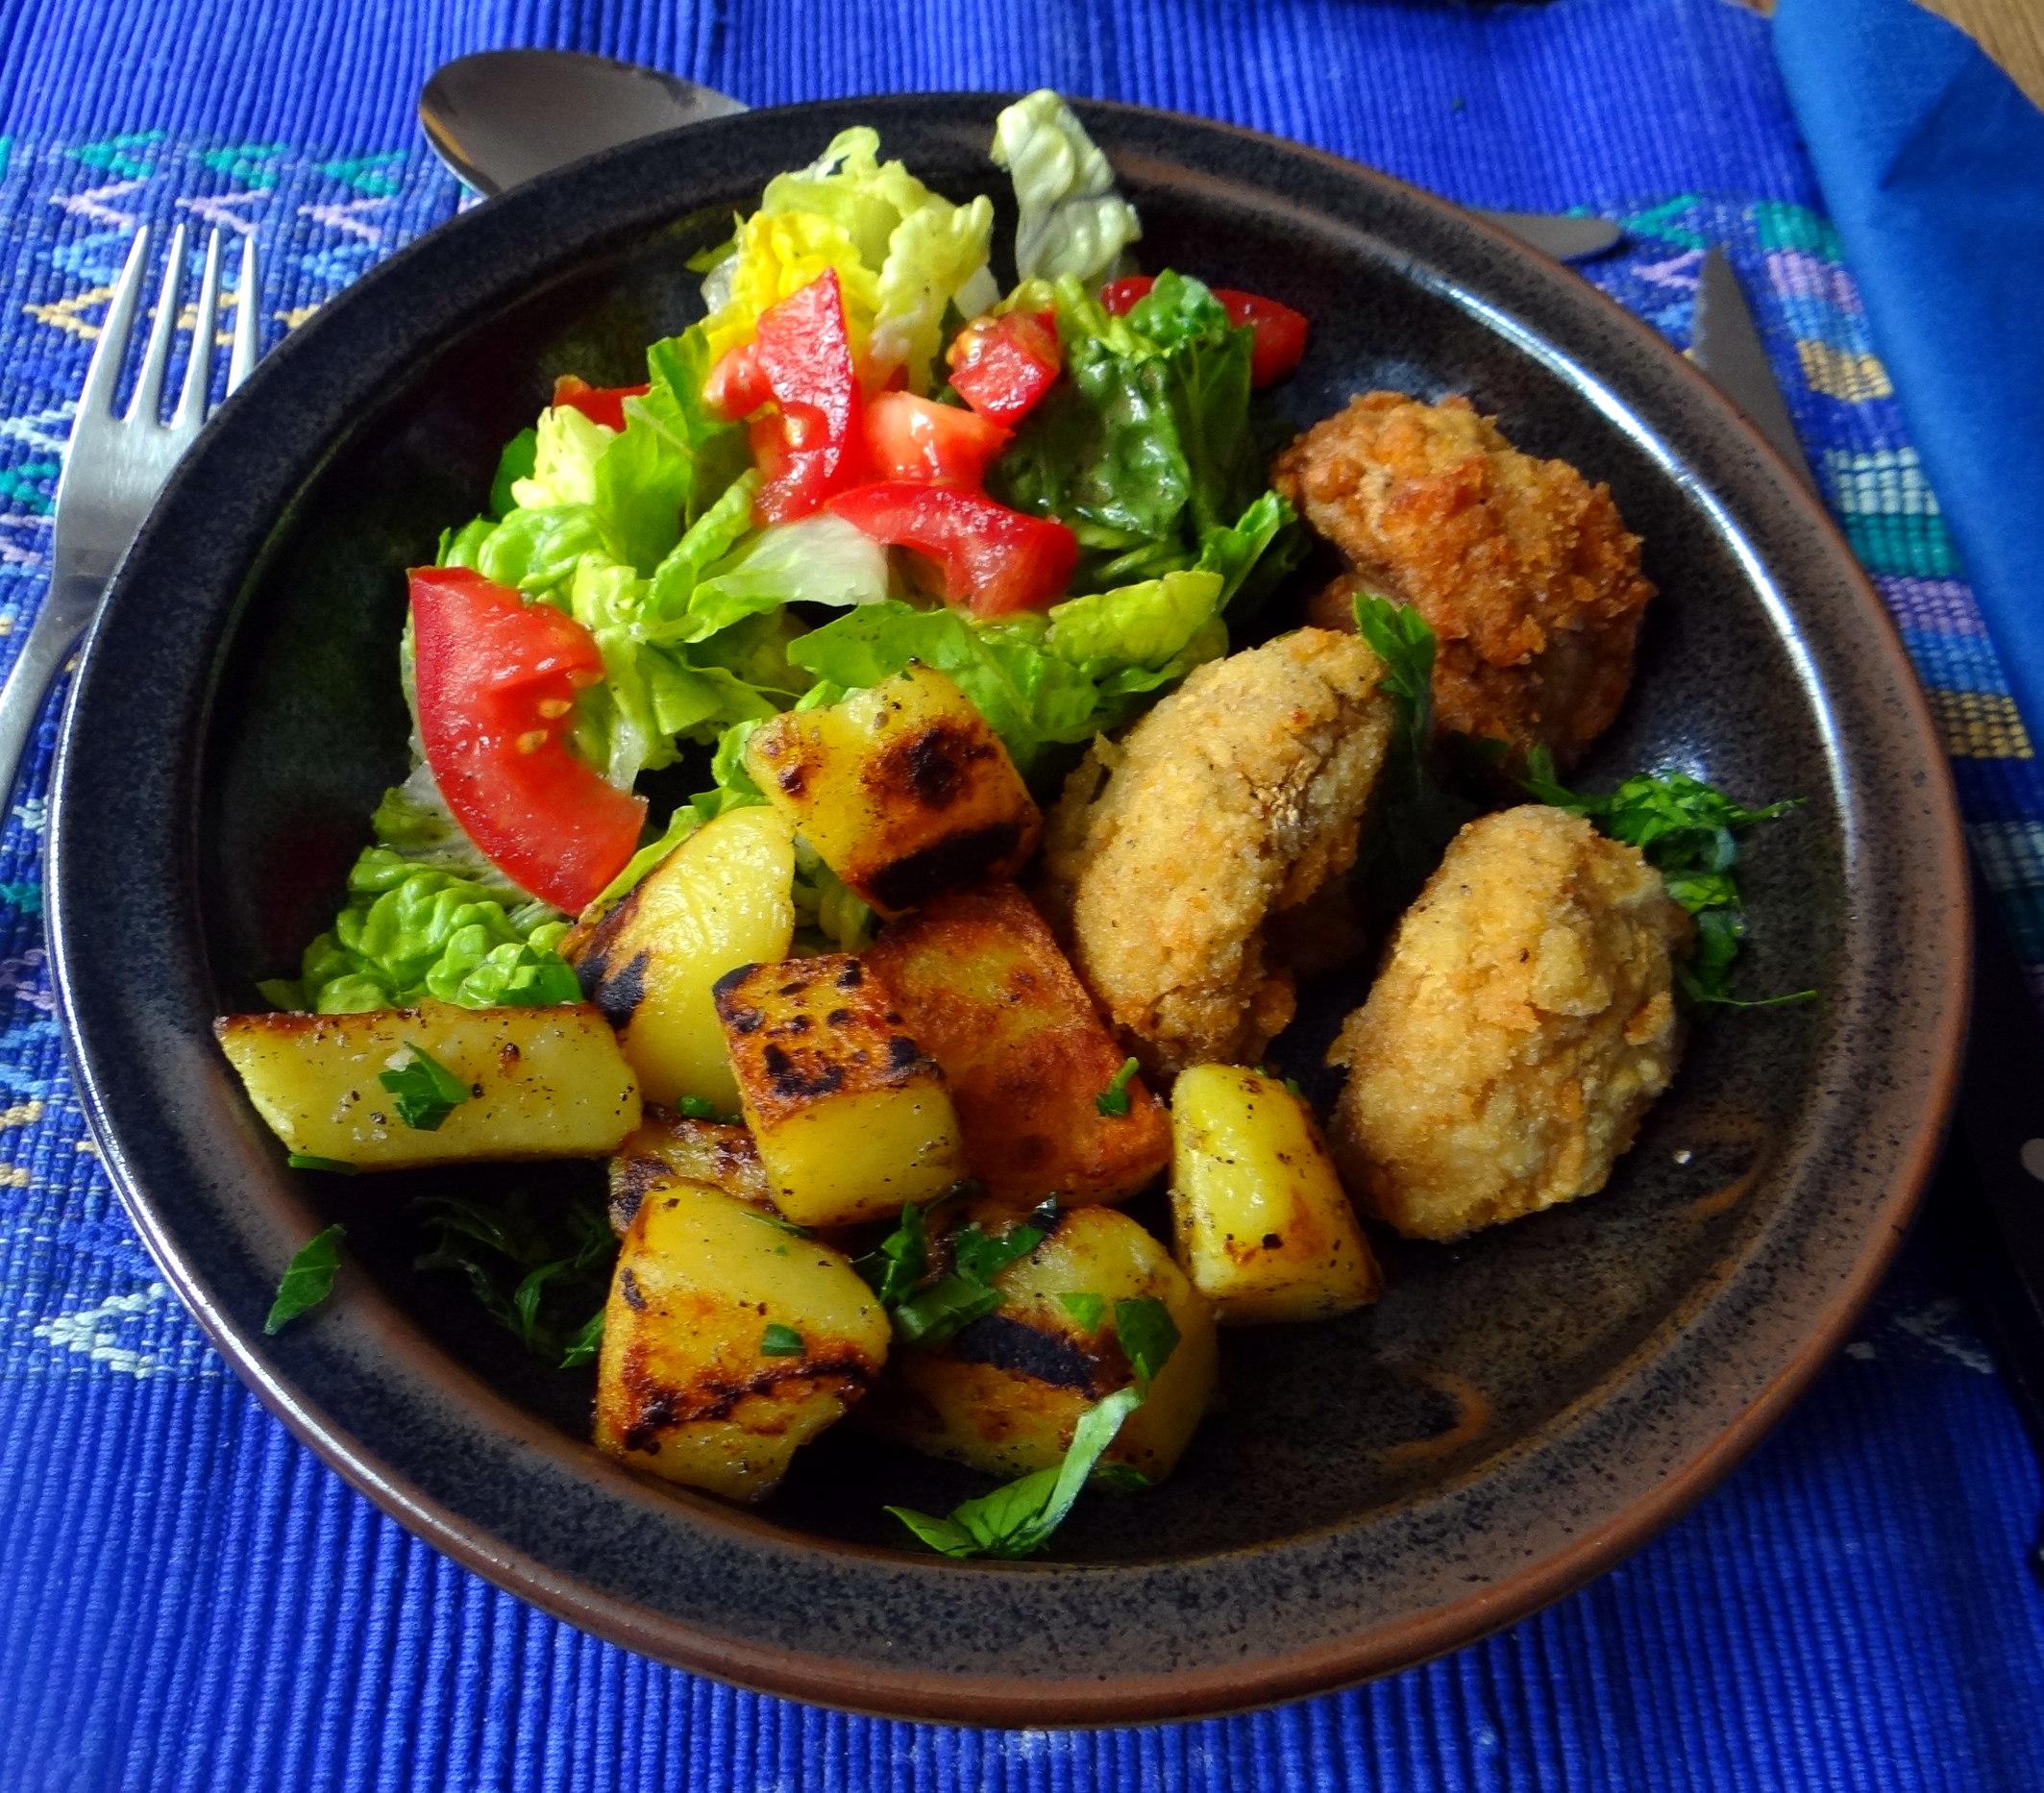 Fritierte Portobello,Bratkartoffeln,Pimientos,Salat,vegan (2)